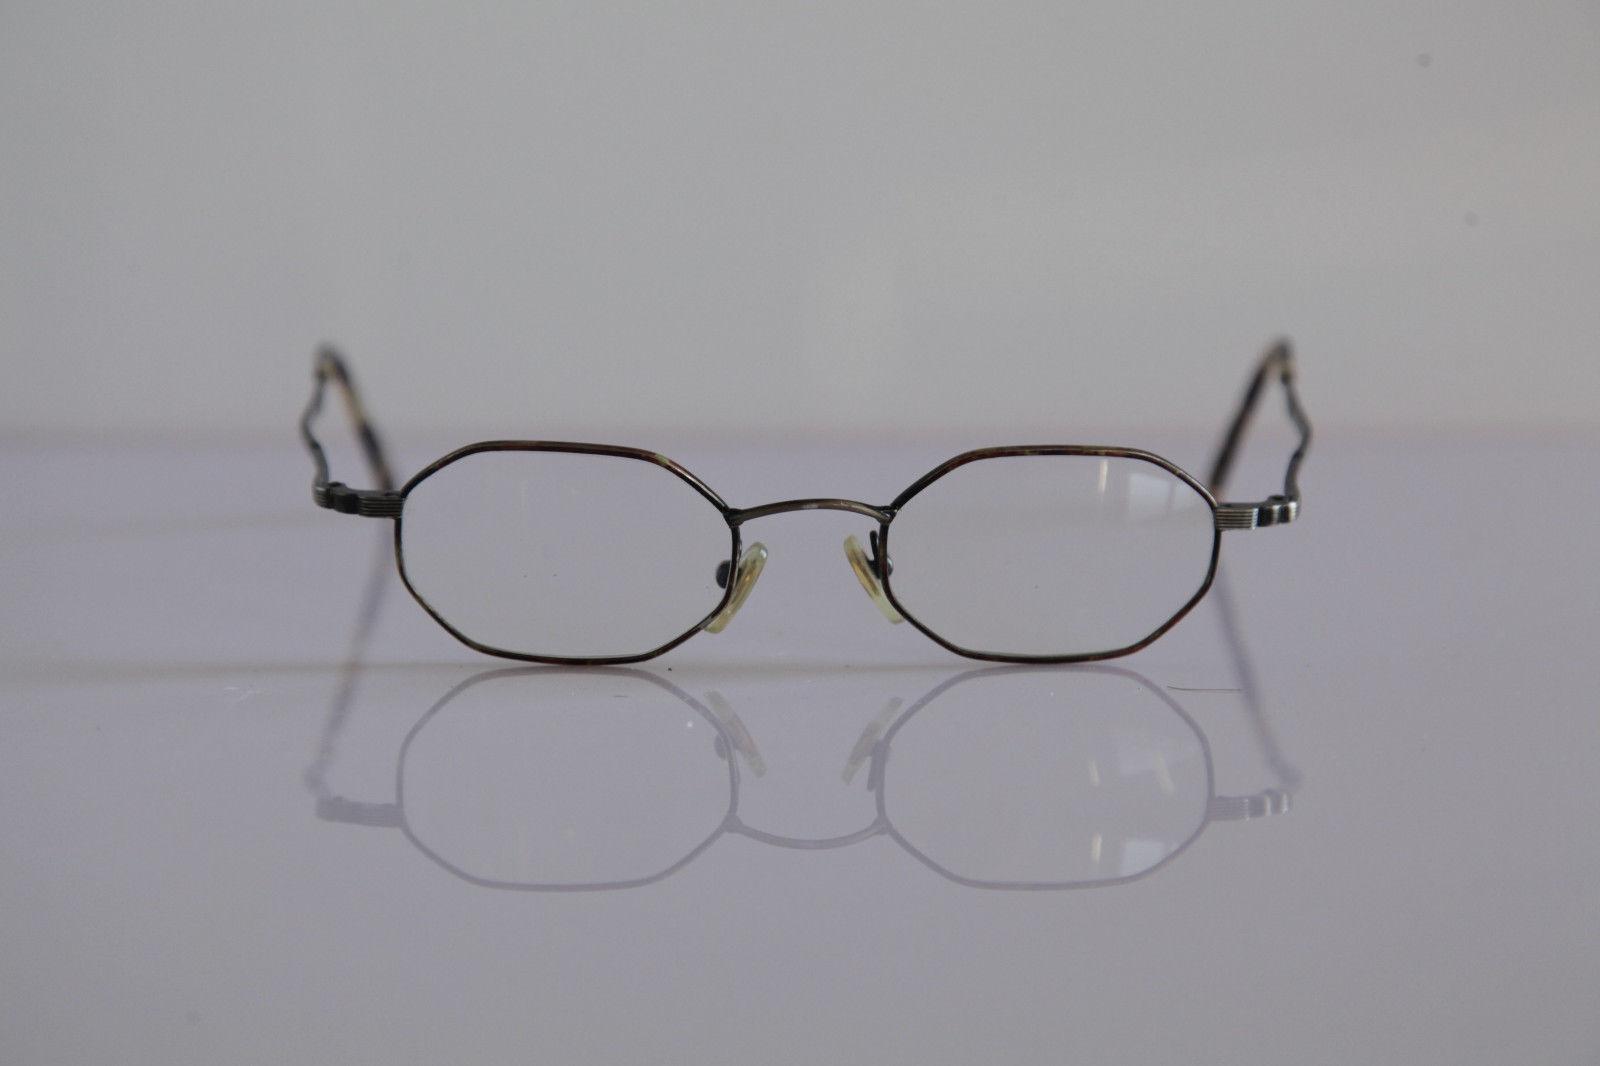 fielmann domani eyewear gold frame rx able